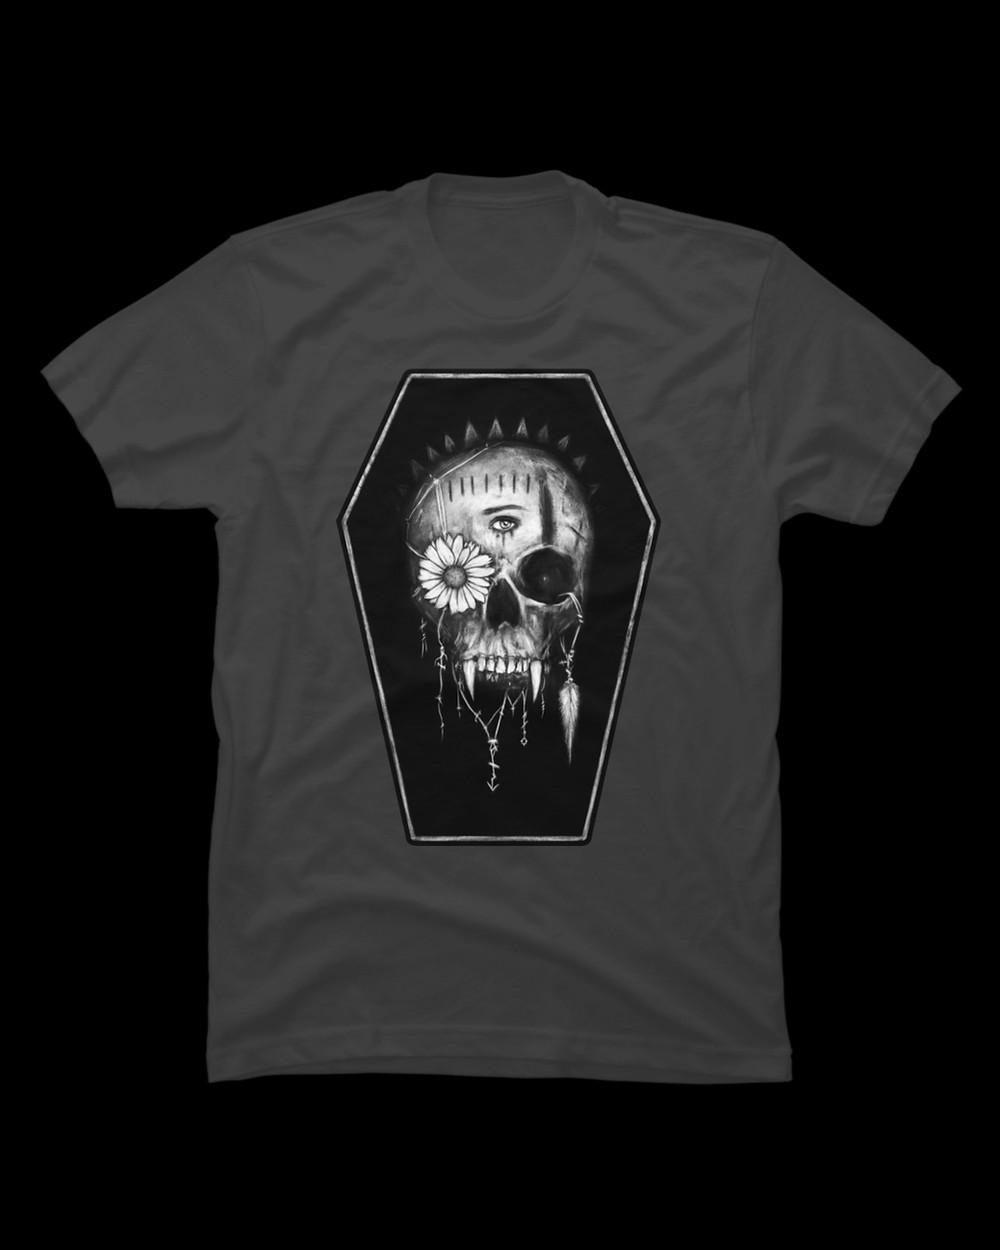 Men's vampire skull t-shirt from Design by Humans